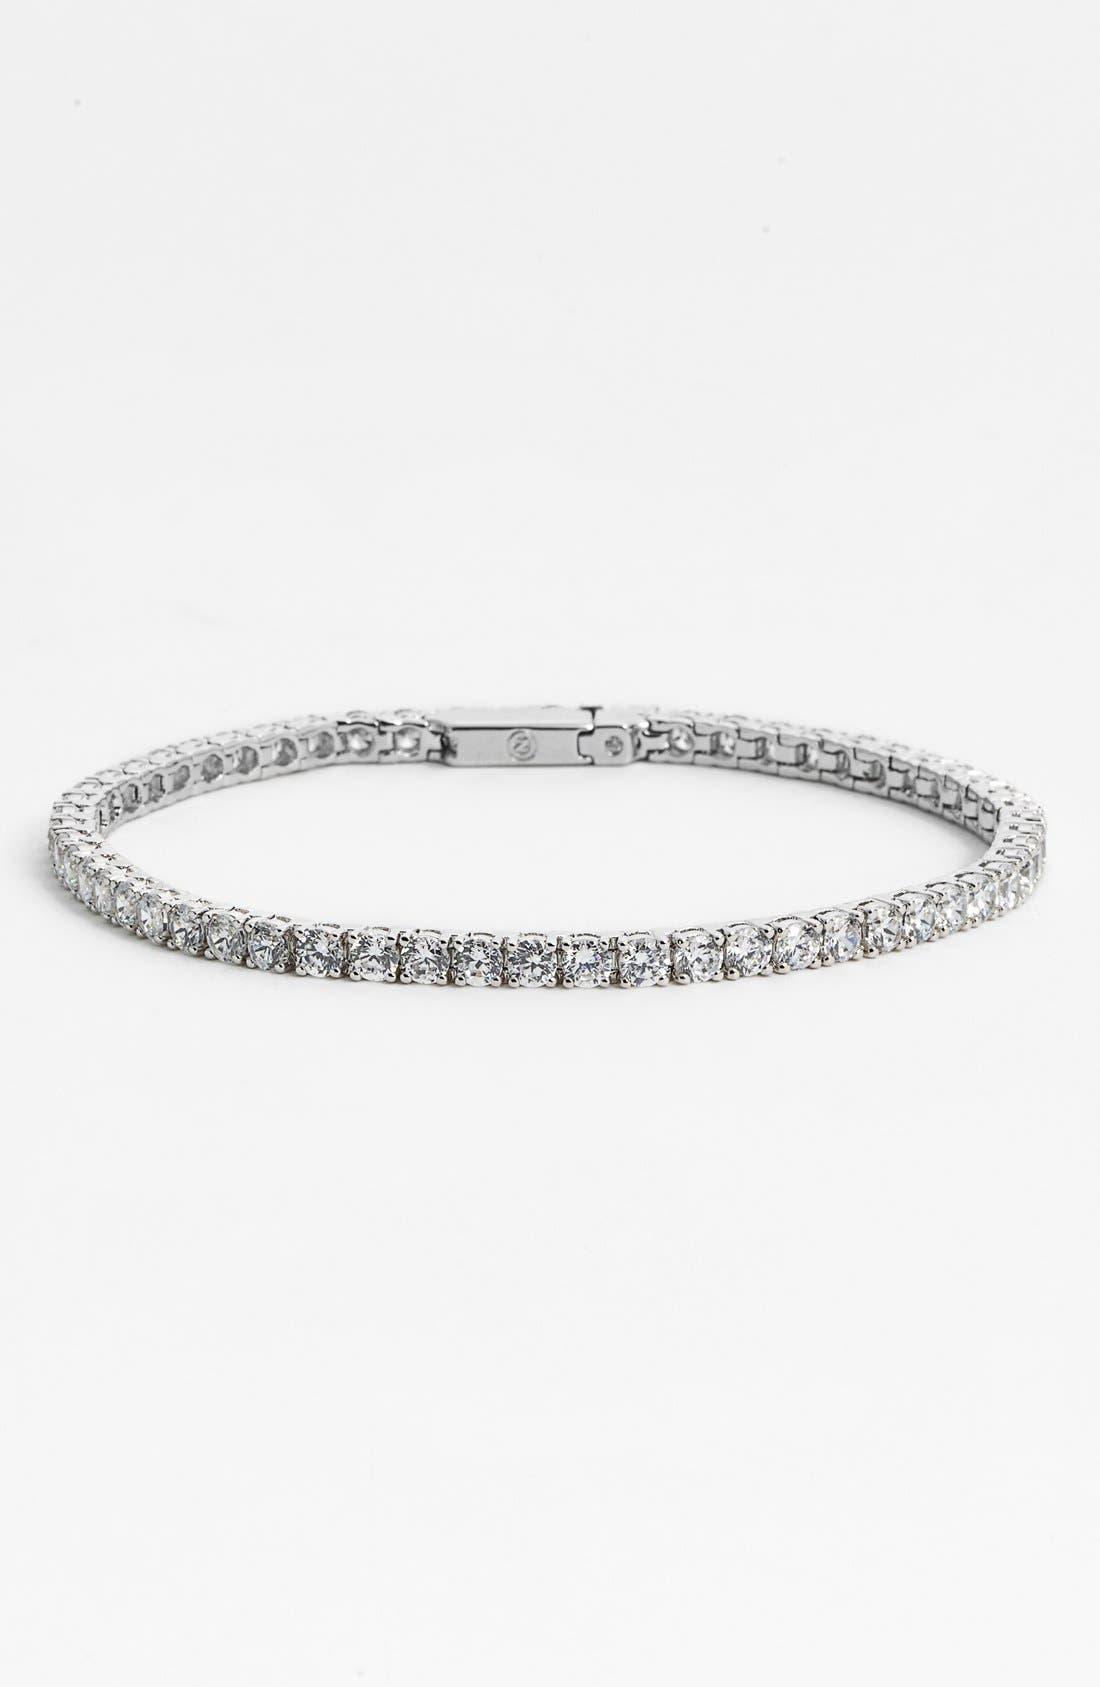 Main Image - Nadri Small Tennis Bracelet